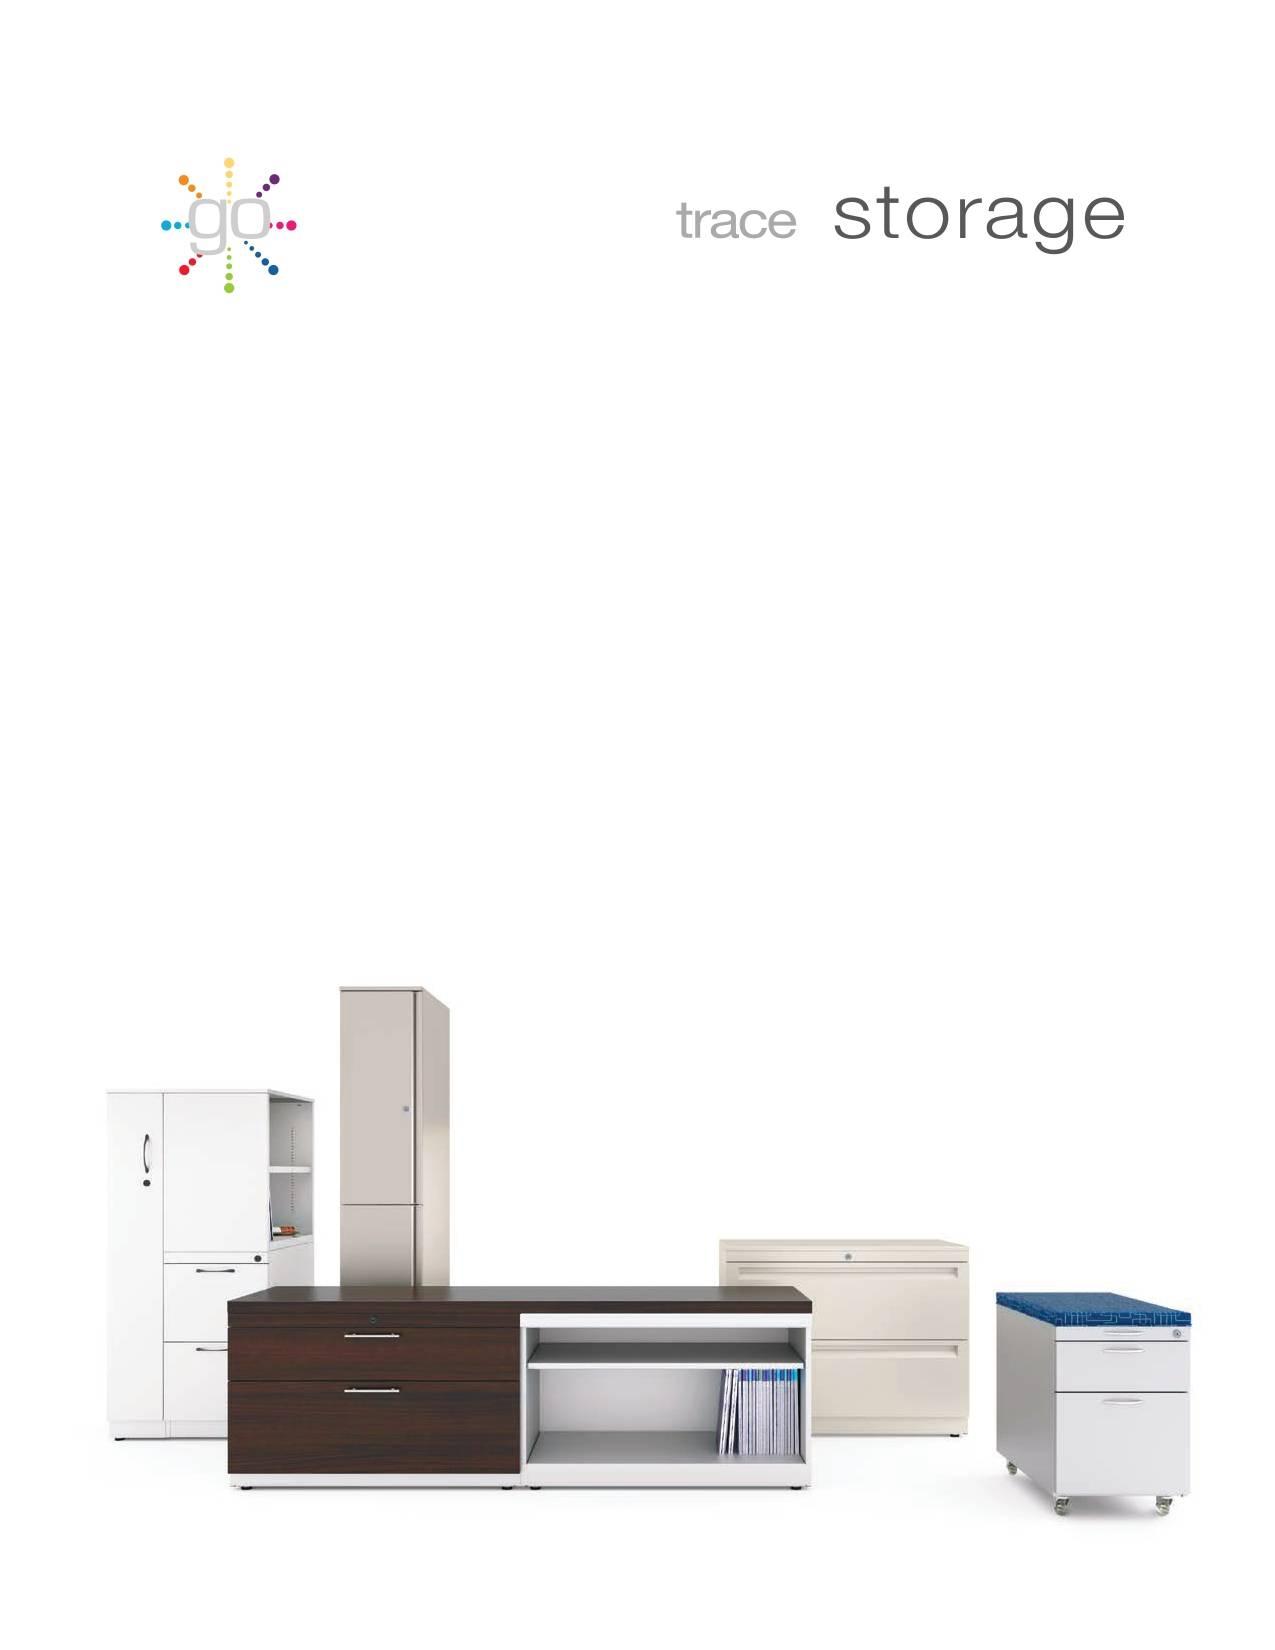 Great Openings Trace Storage Brochure